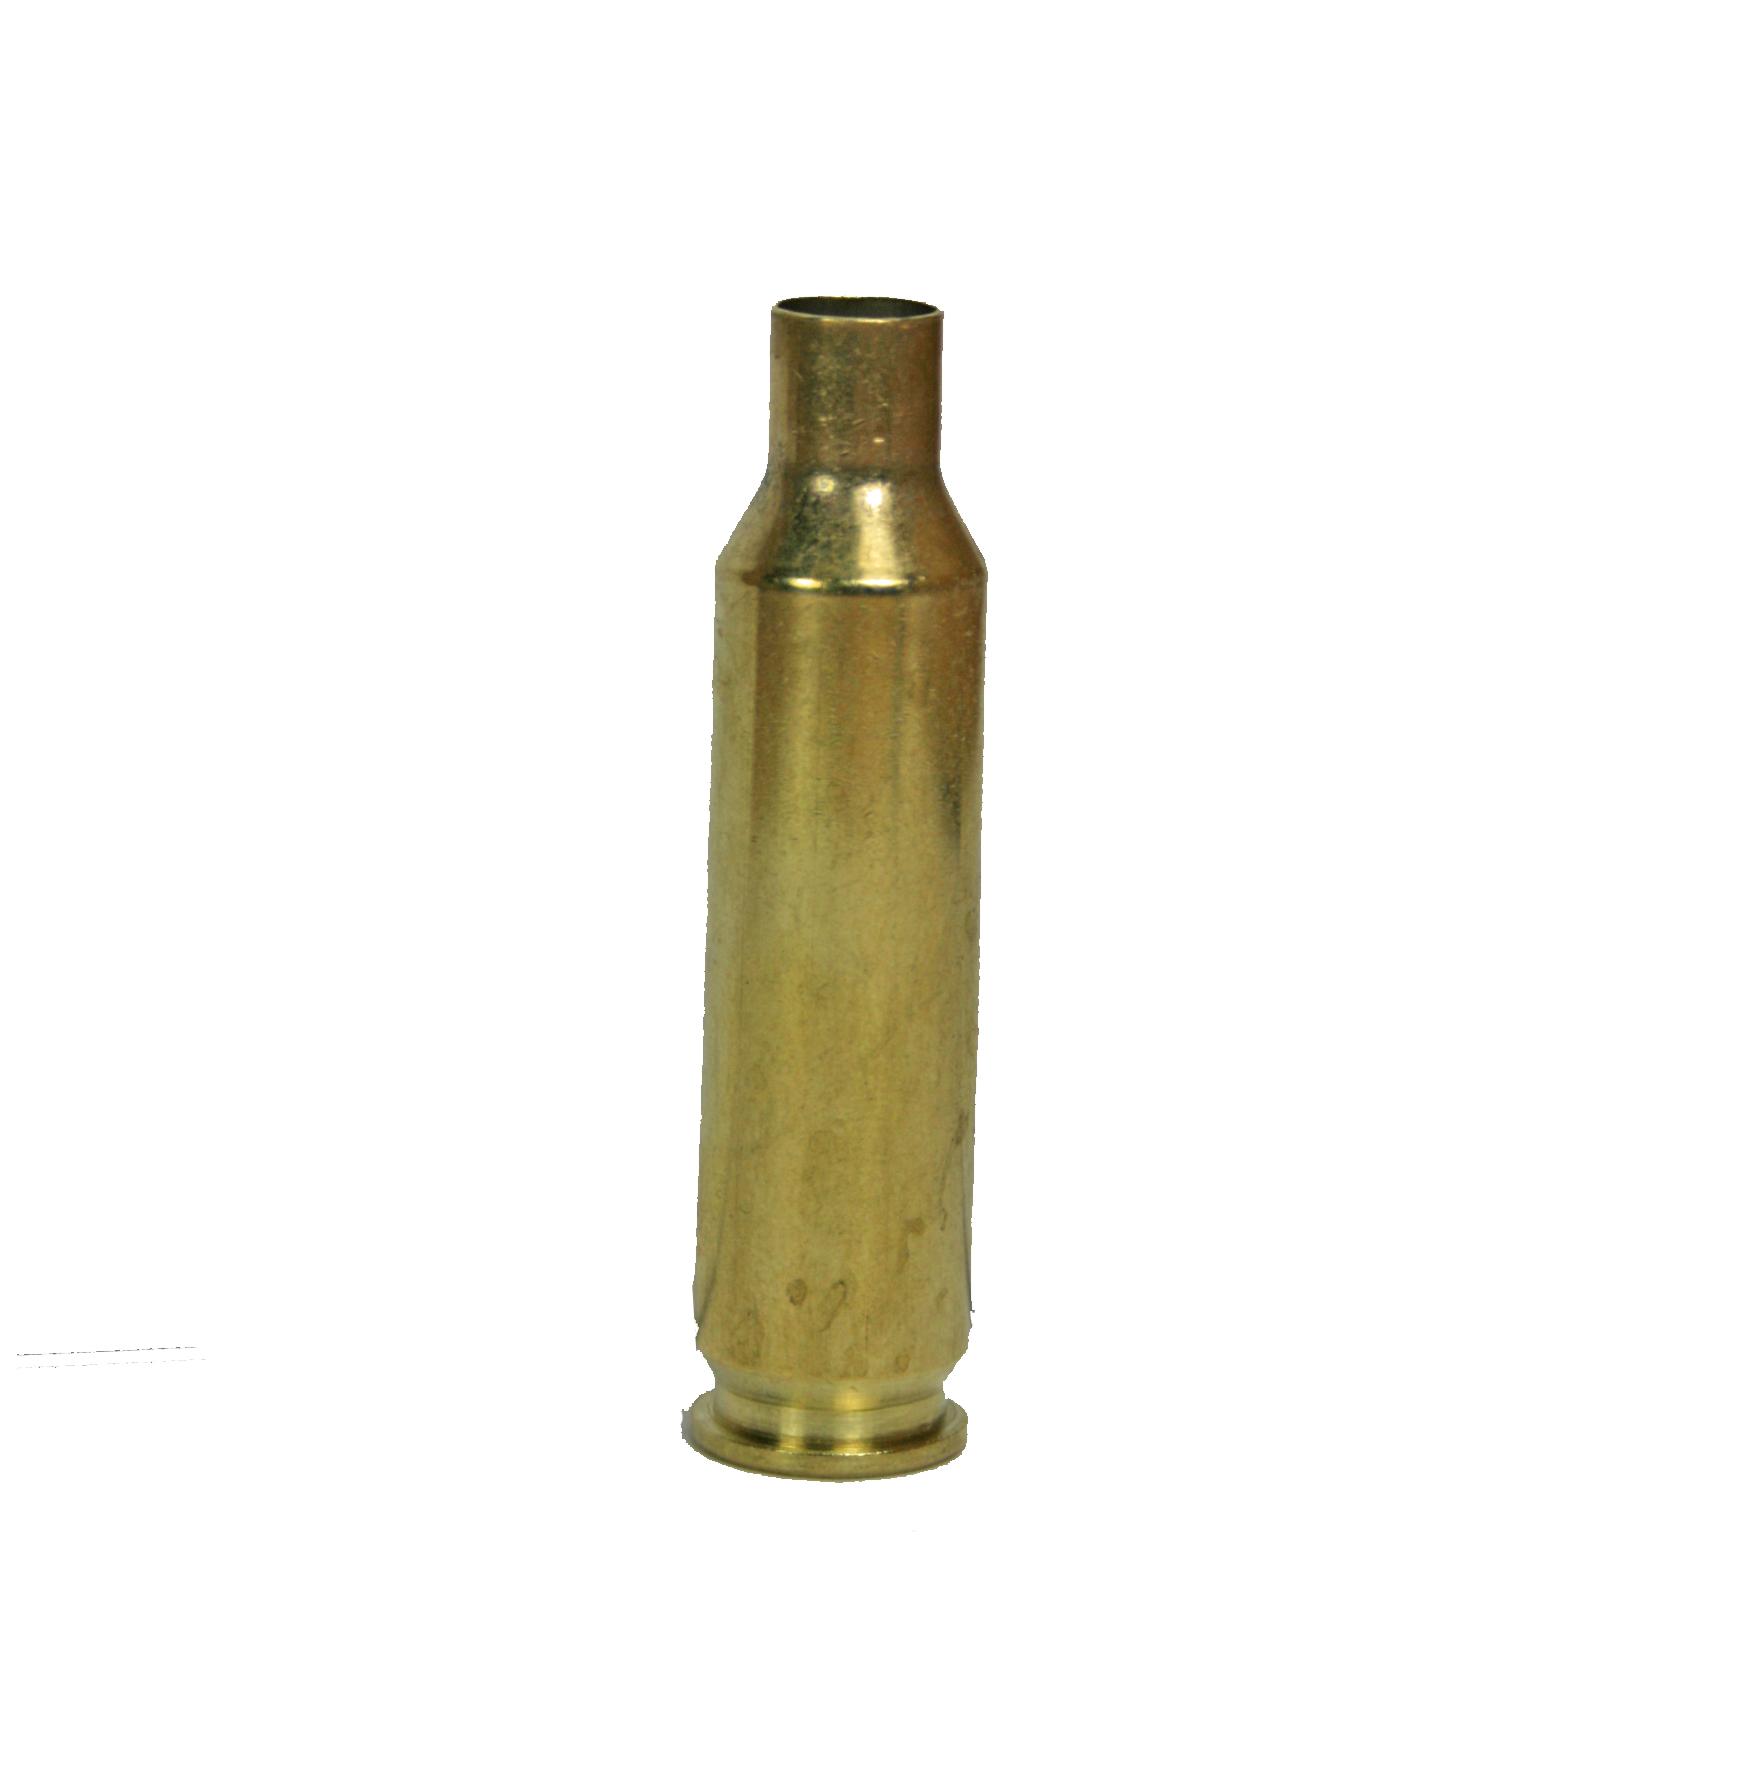 Hornady 6 5 Creedmoor Unprimed Brass (Bulk Package of 100